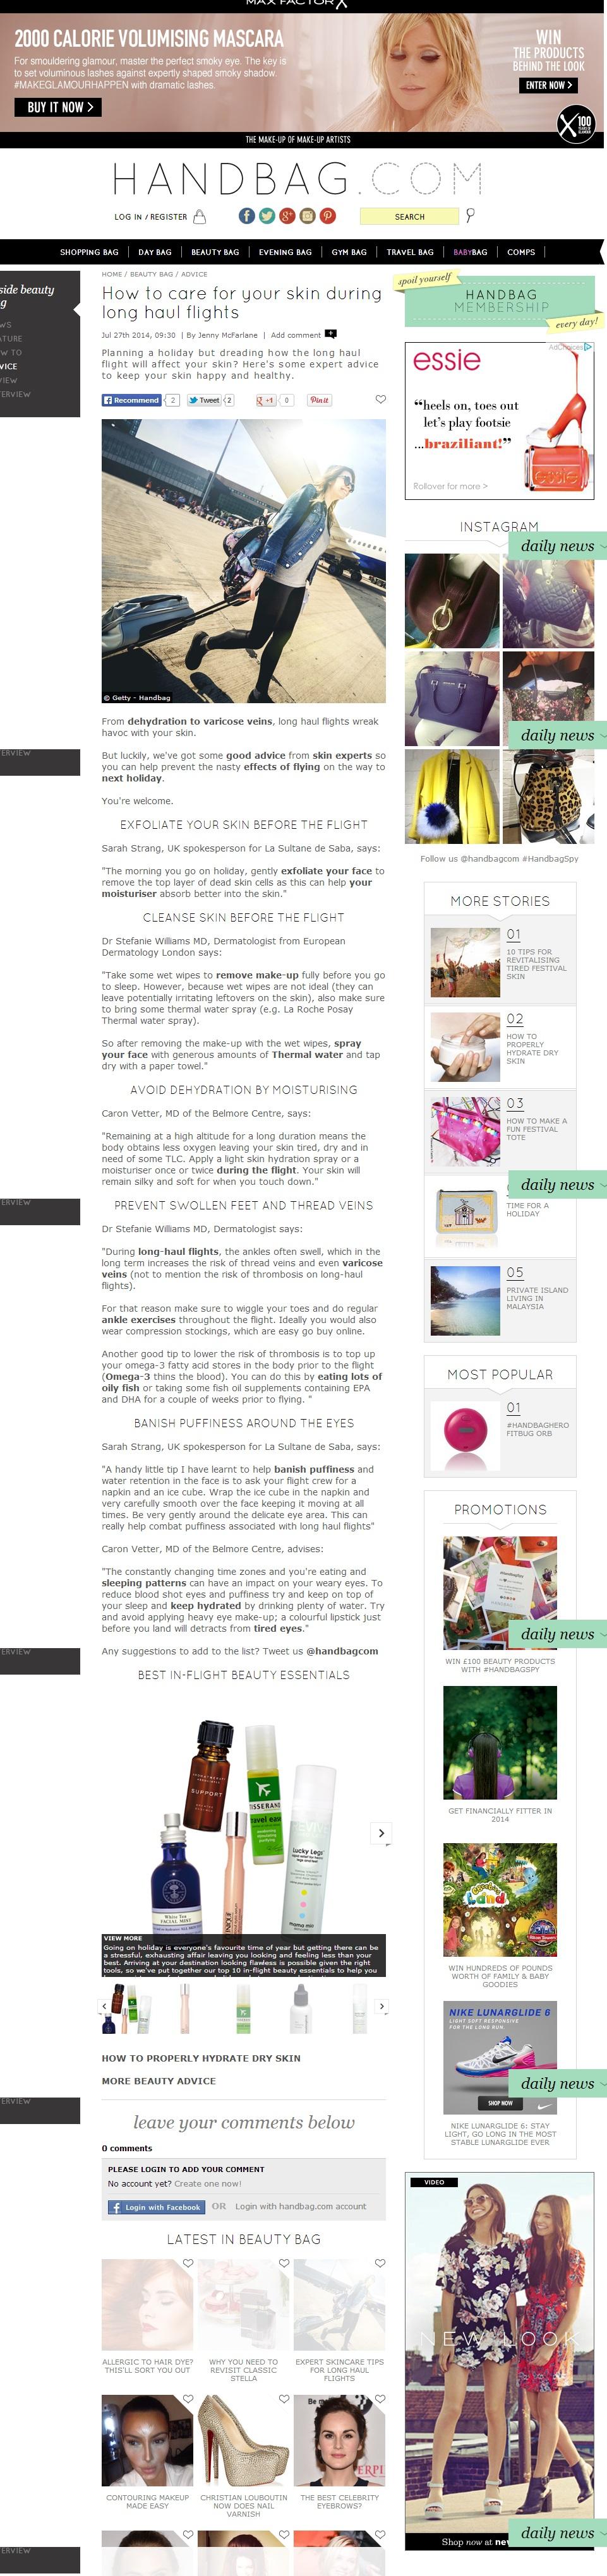 screencapture-www-handbag-com-beauty-bag-advice-a587625-how-to-care-for-your-skin-during-long-haul-flights-html